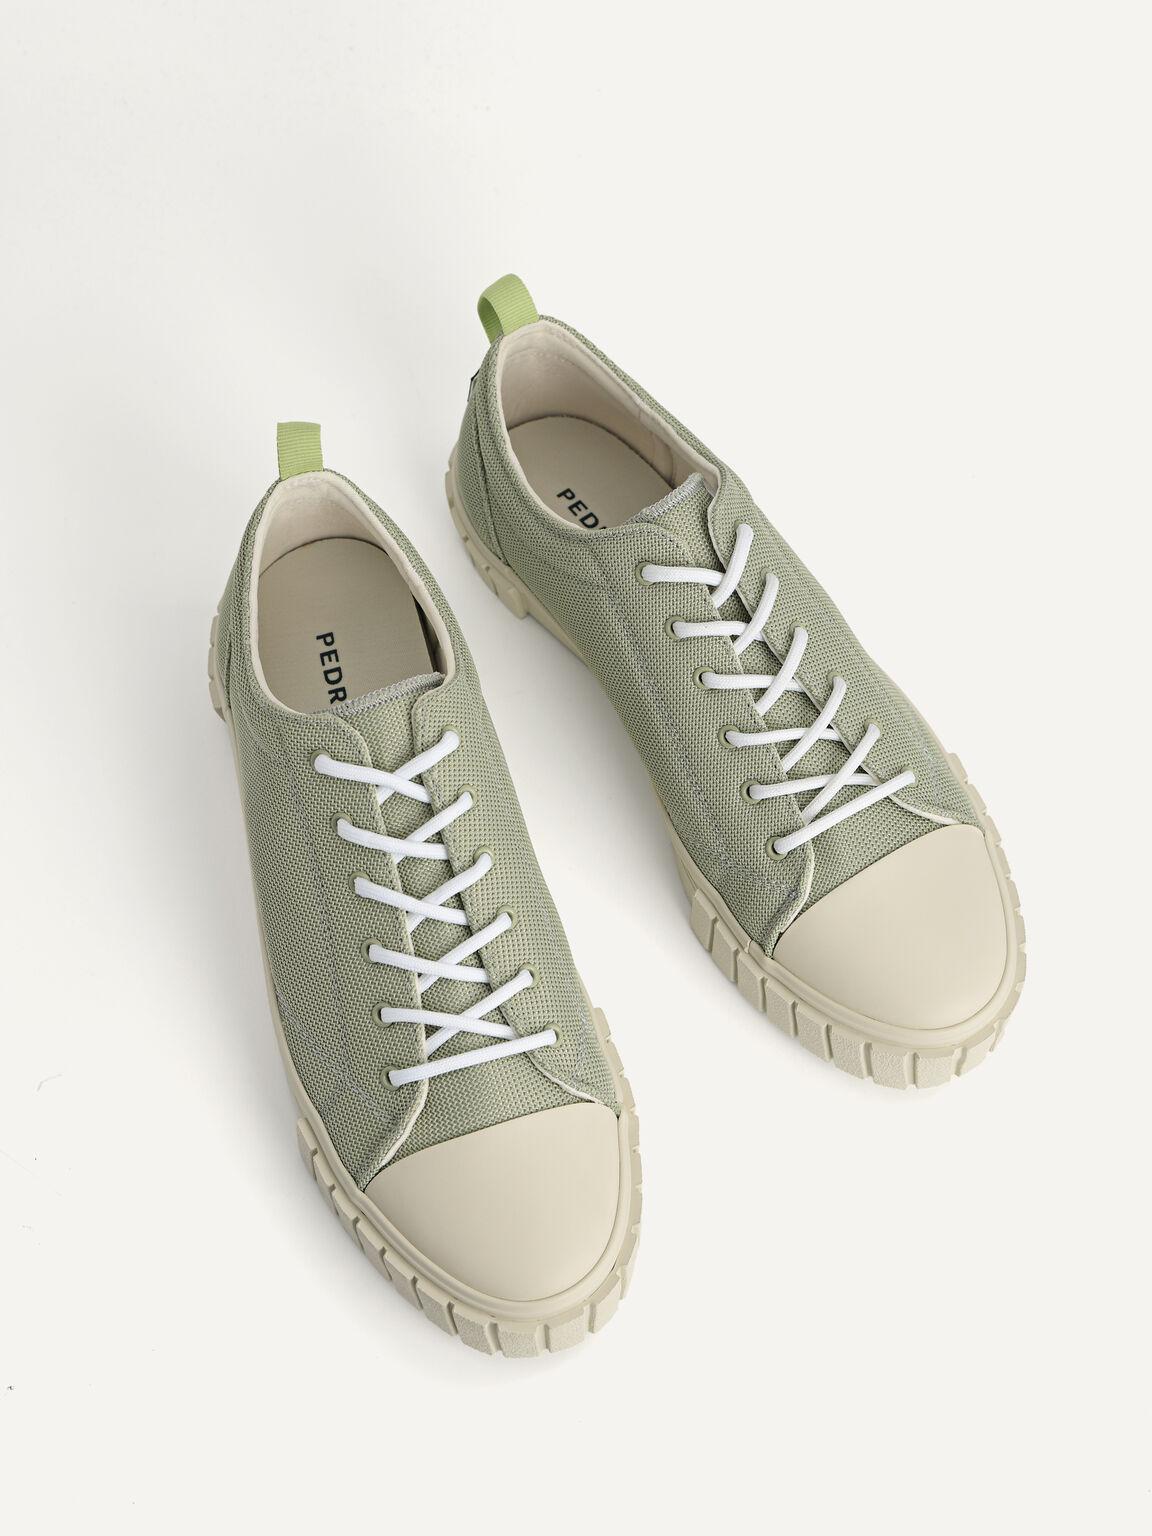 Beat Court Sneakers, Light Green, hi-res